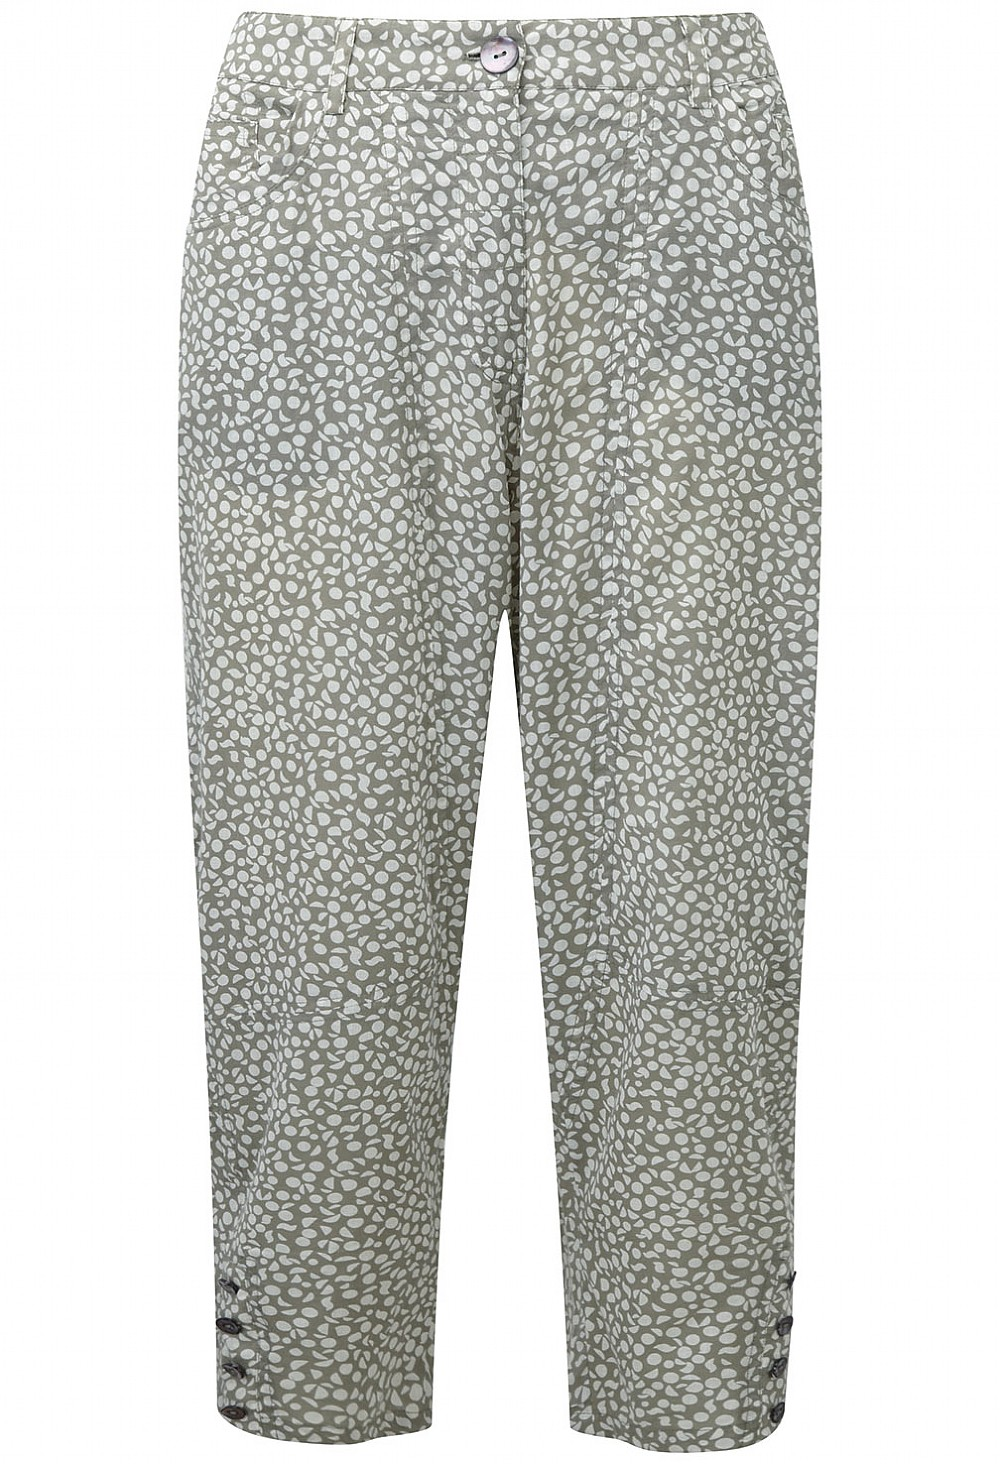 Safari Spot Safari Trouser